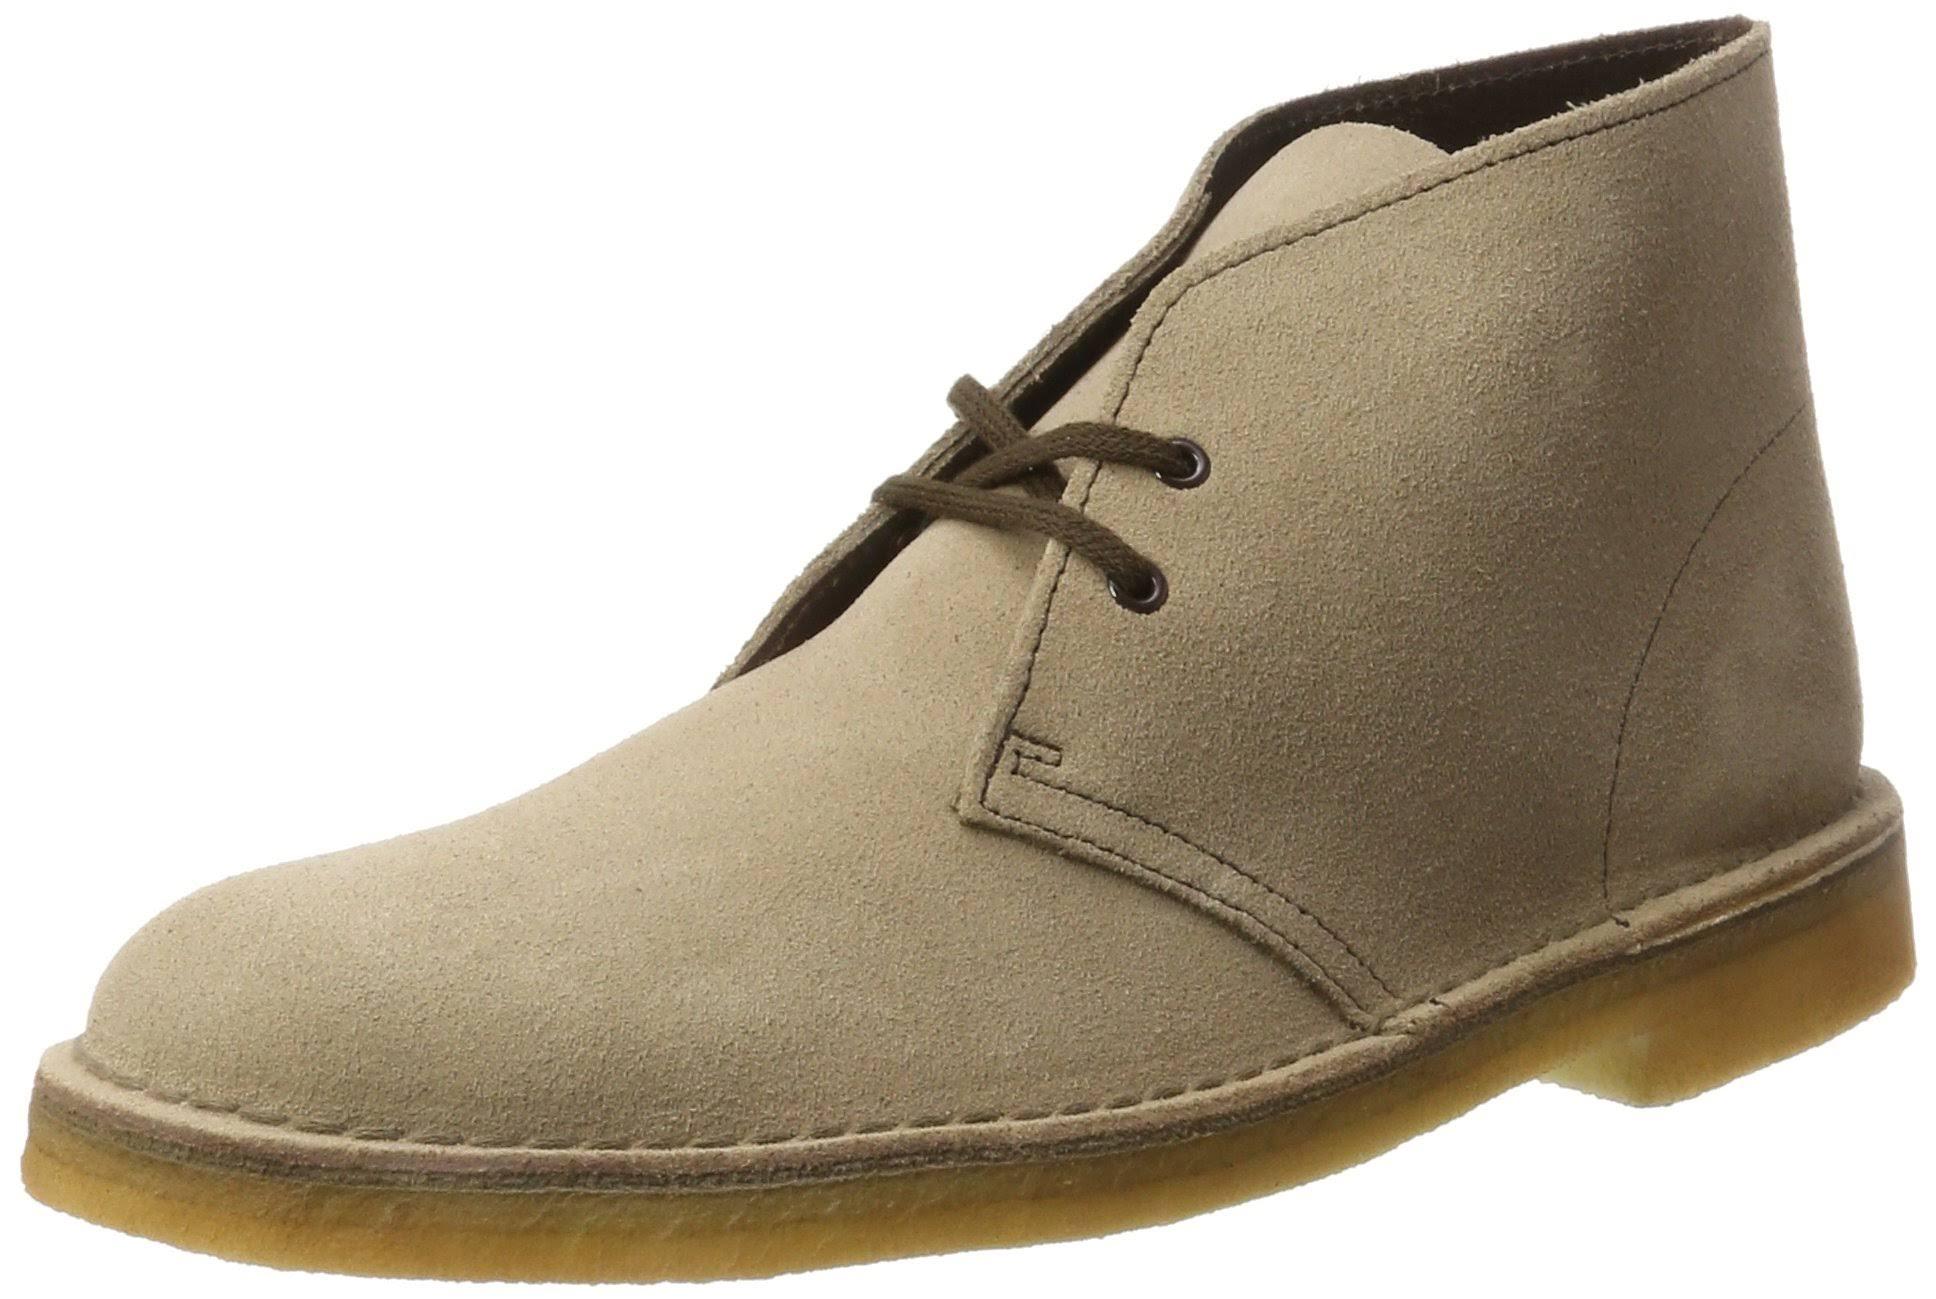 Clarks Desert Originals Originals BootsWolf Desert Clarks xWQrCBoEde